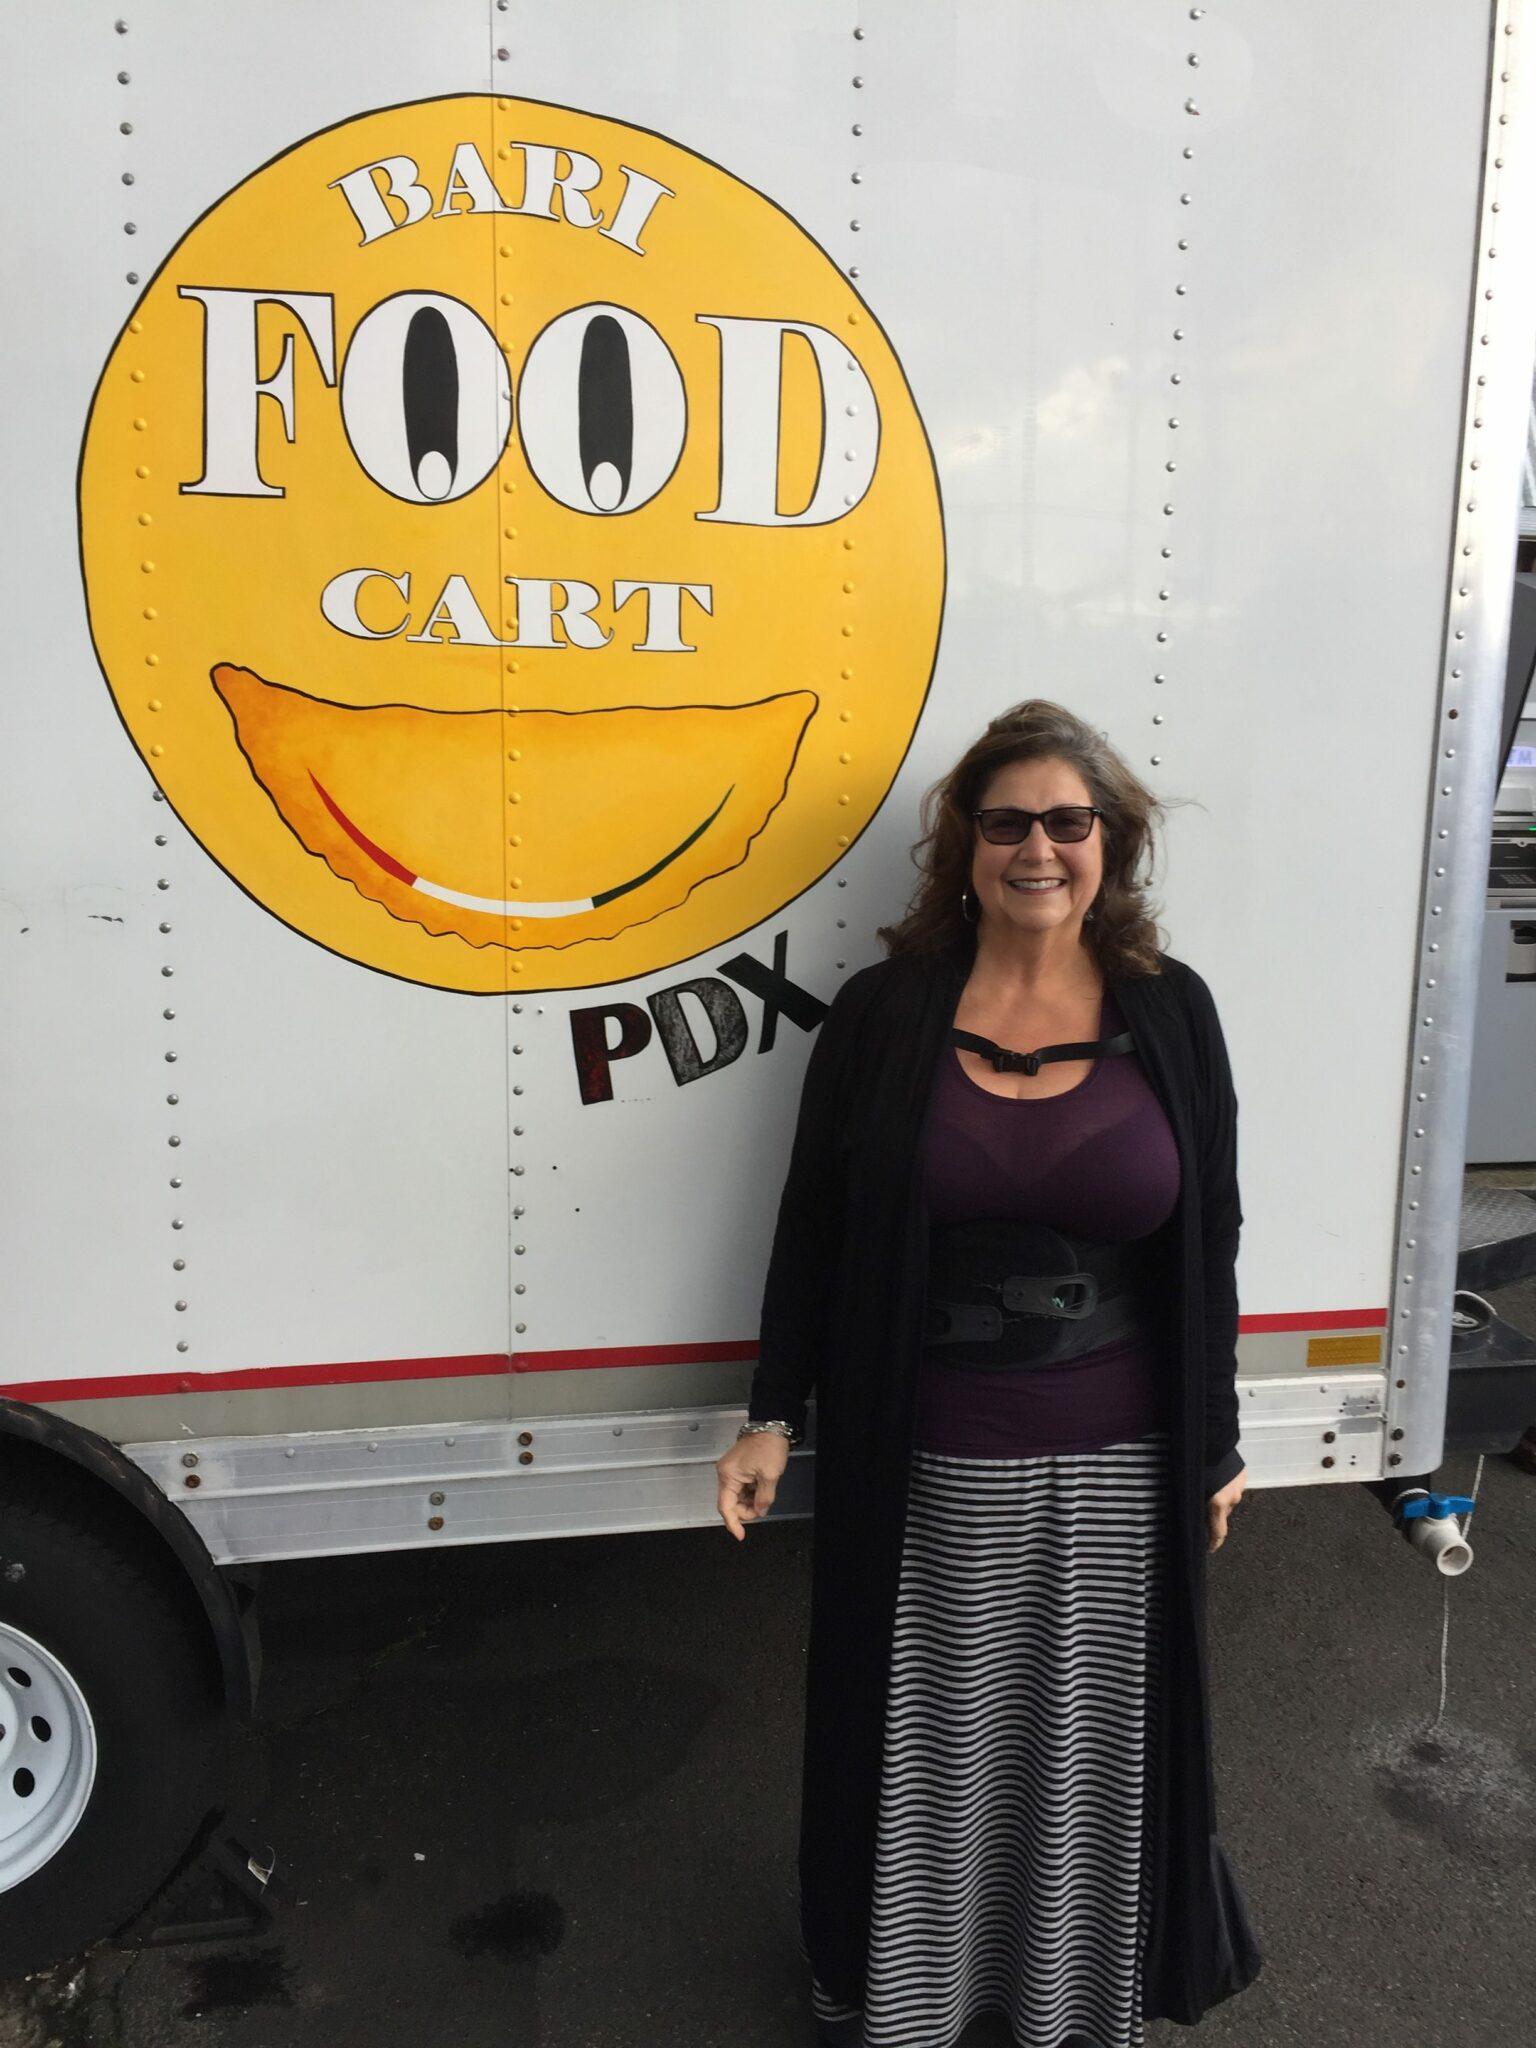 Bari Food Cart in Portland